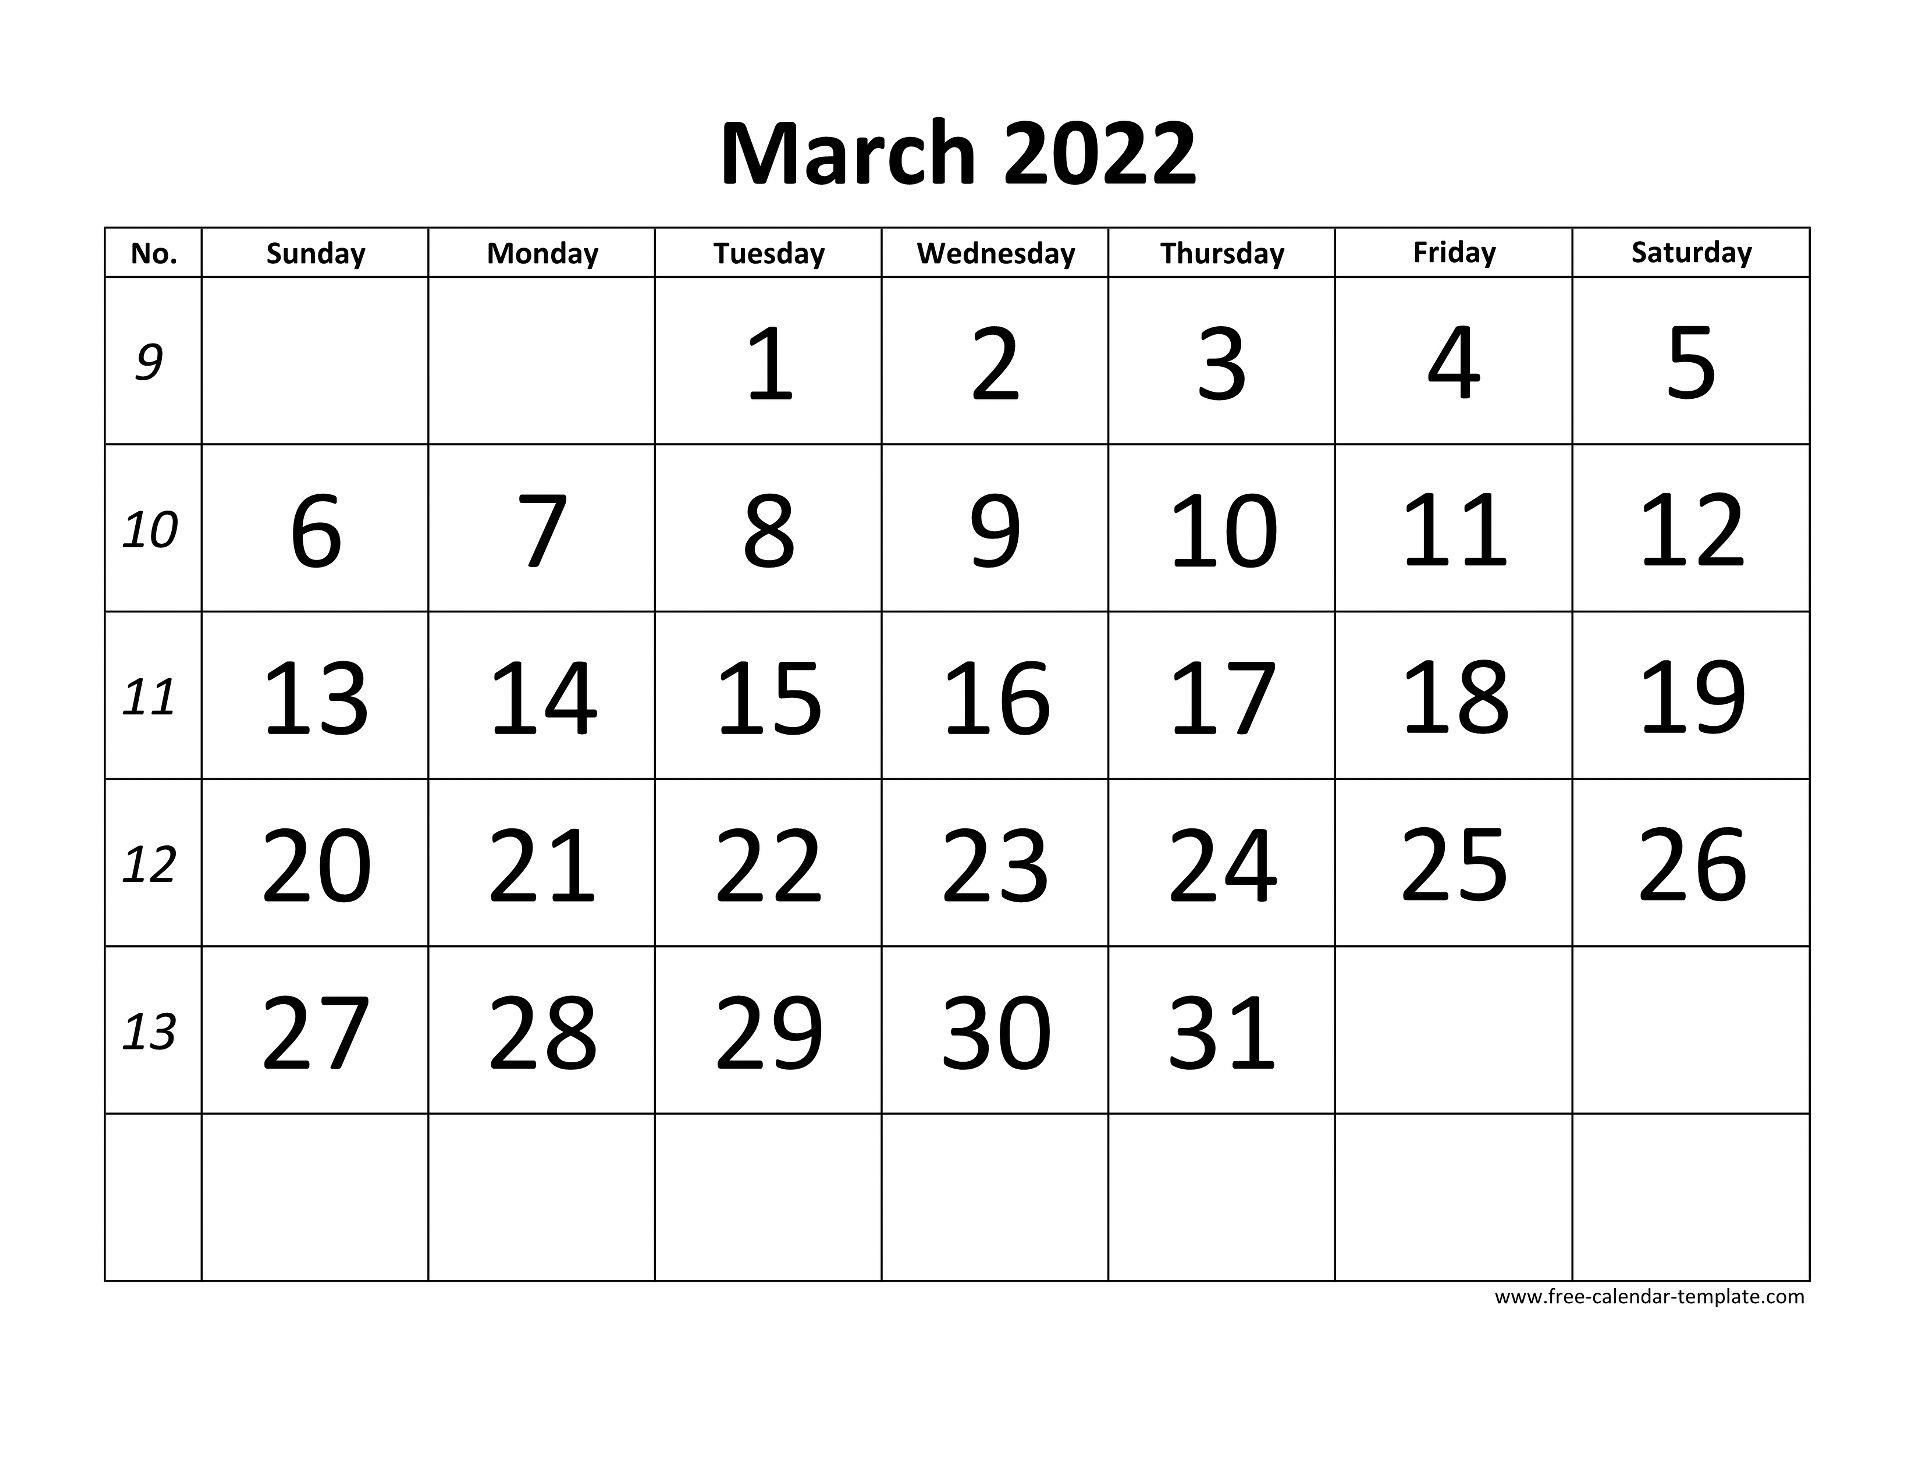 Calendar Template March 2022.March 2022 Calendar Designed With Large Font Horizontal Free Calendar Template Com